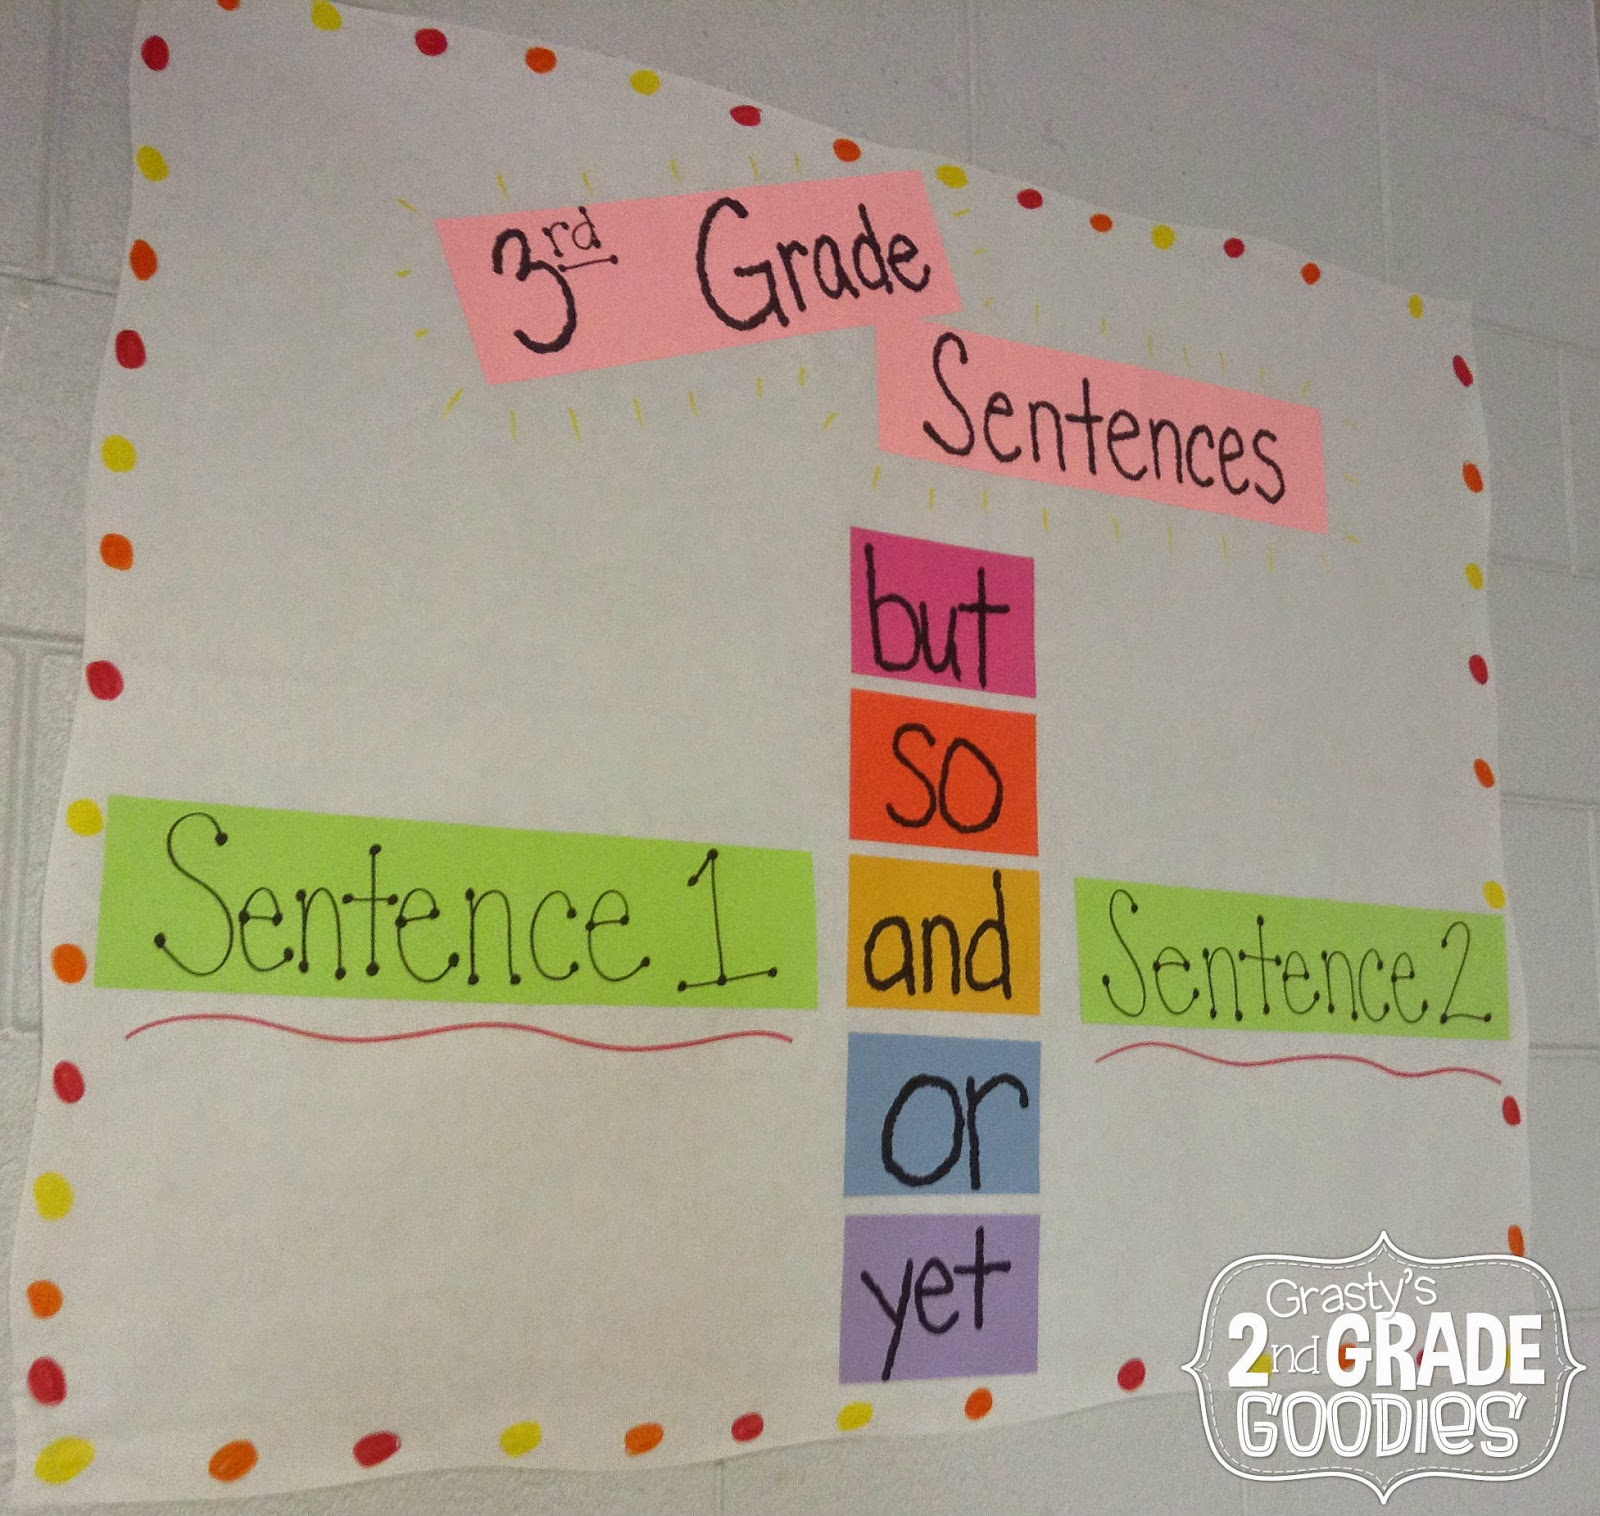 Grasty S 2nd Grade Goo S Writing Compound Sentences Can Be Fun